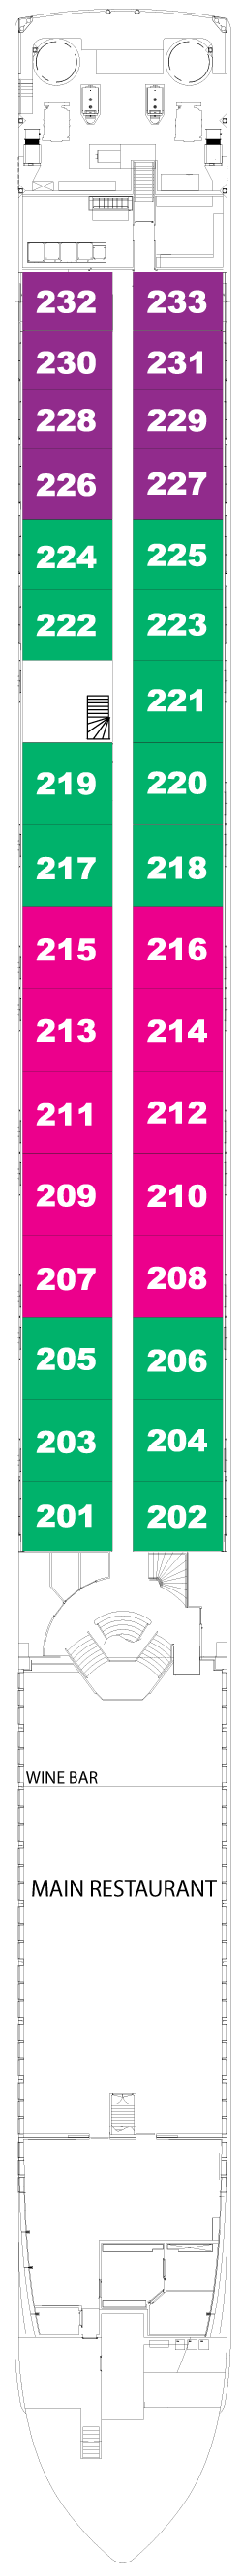 AmaSerena Deck 2